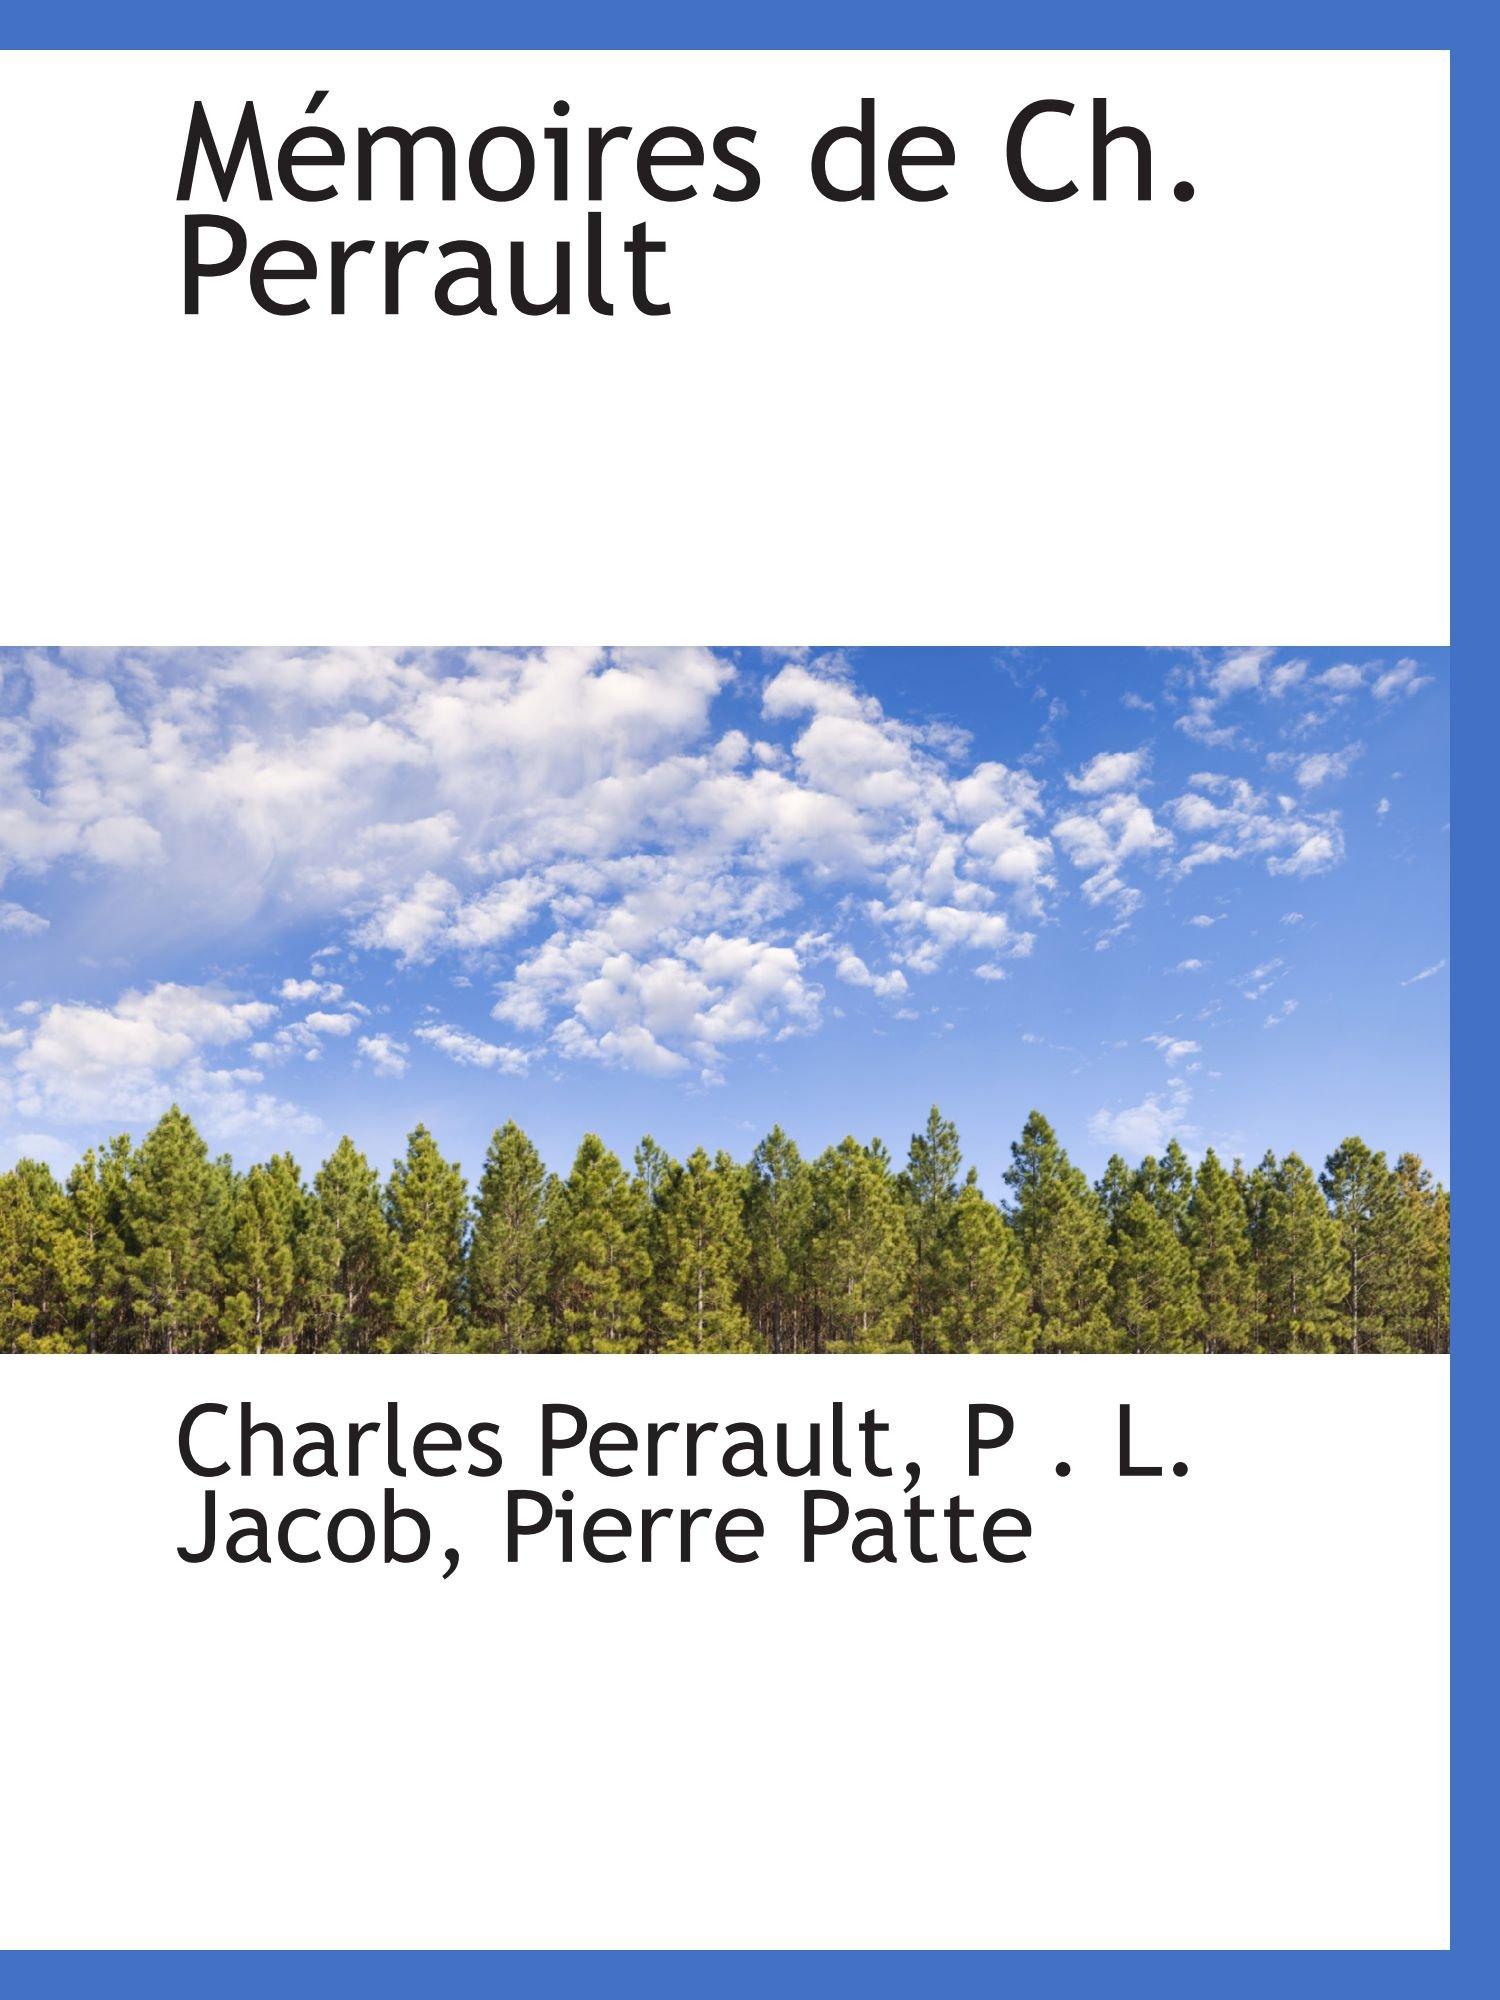 Download Mémoires de Ch. Perrault (Catalan Edition) ebook